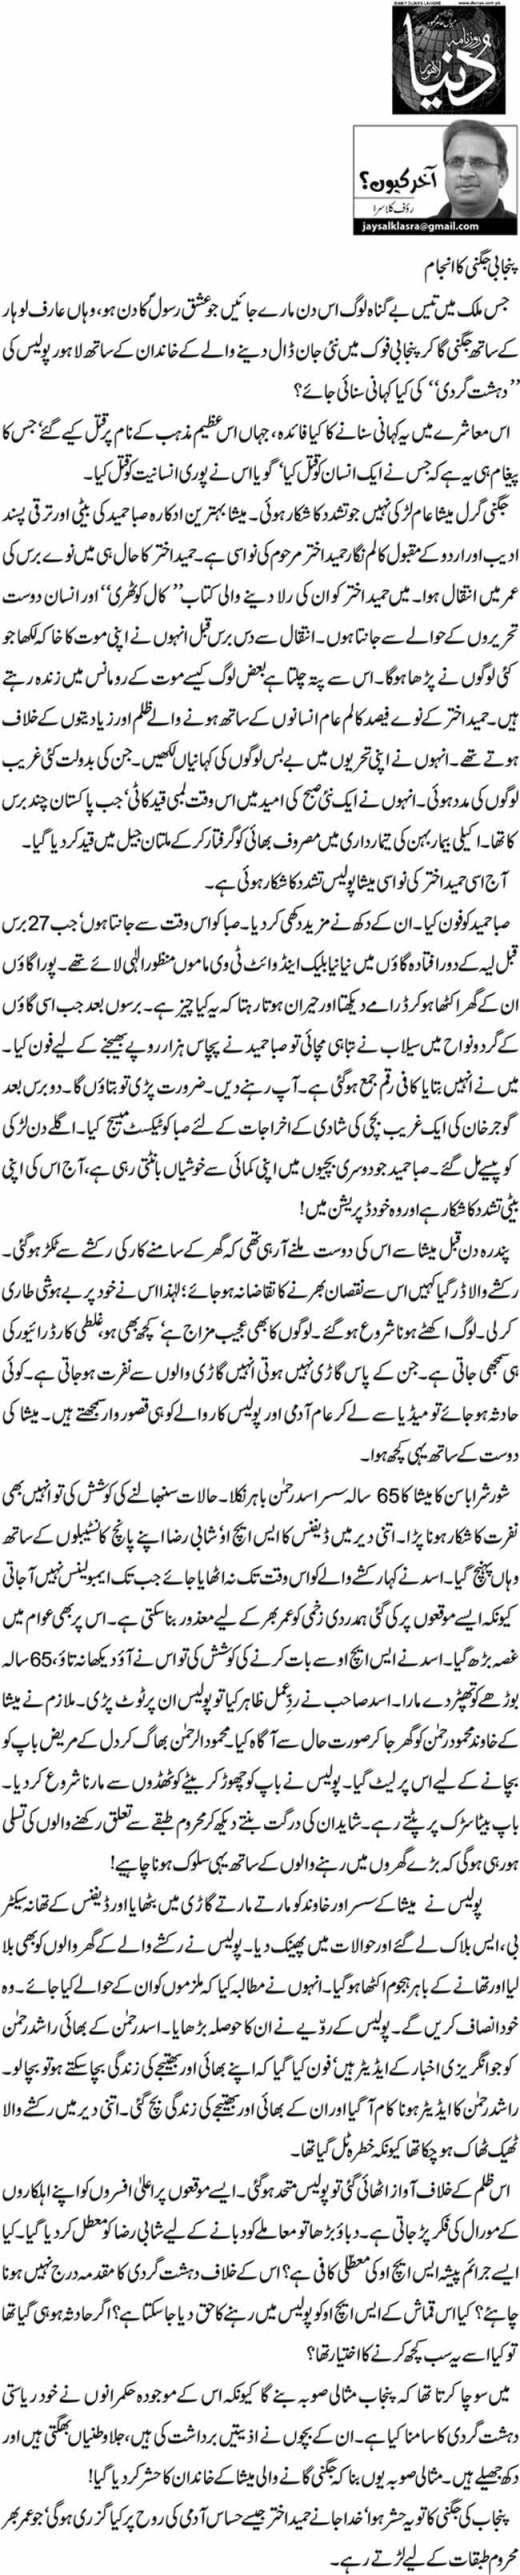 Punjabi jugni ka anjaam - Rauf klasra